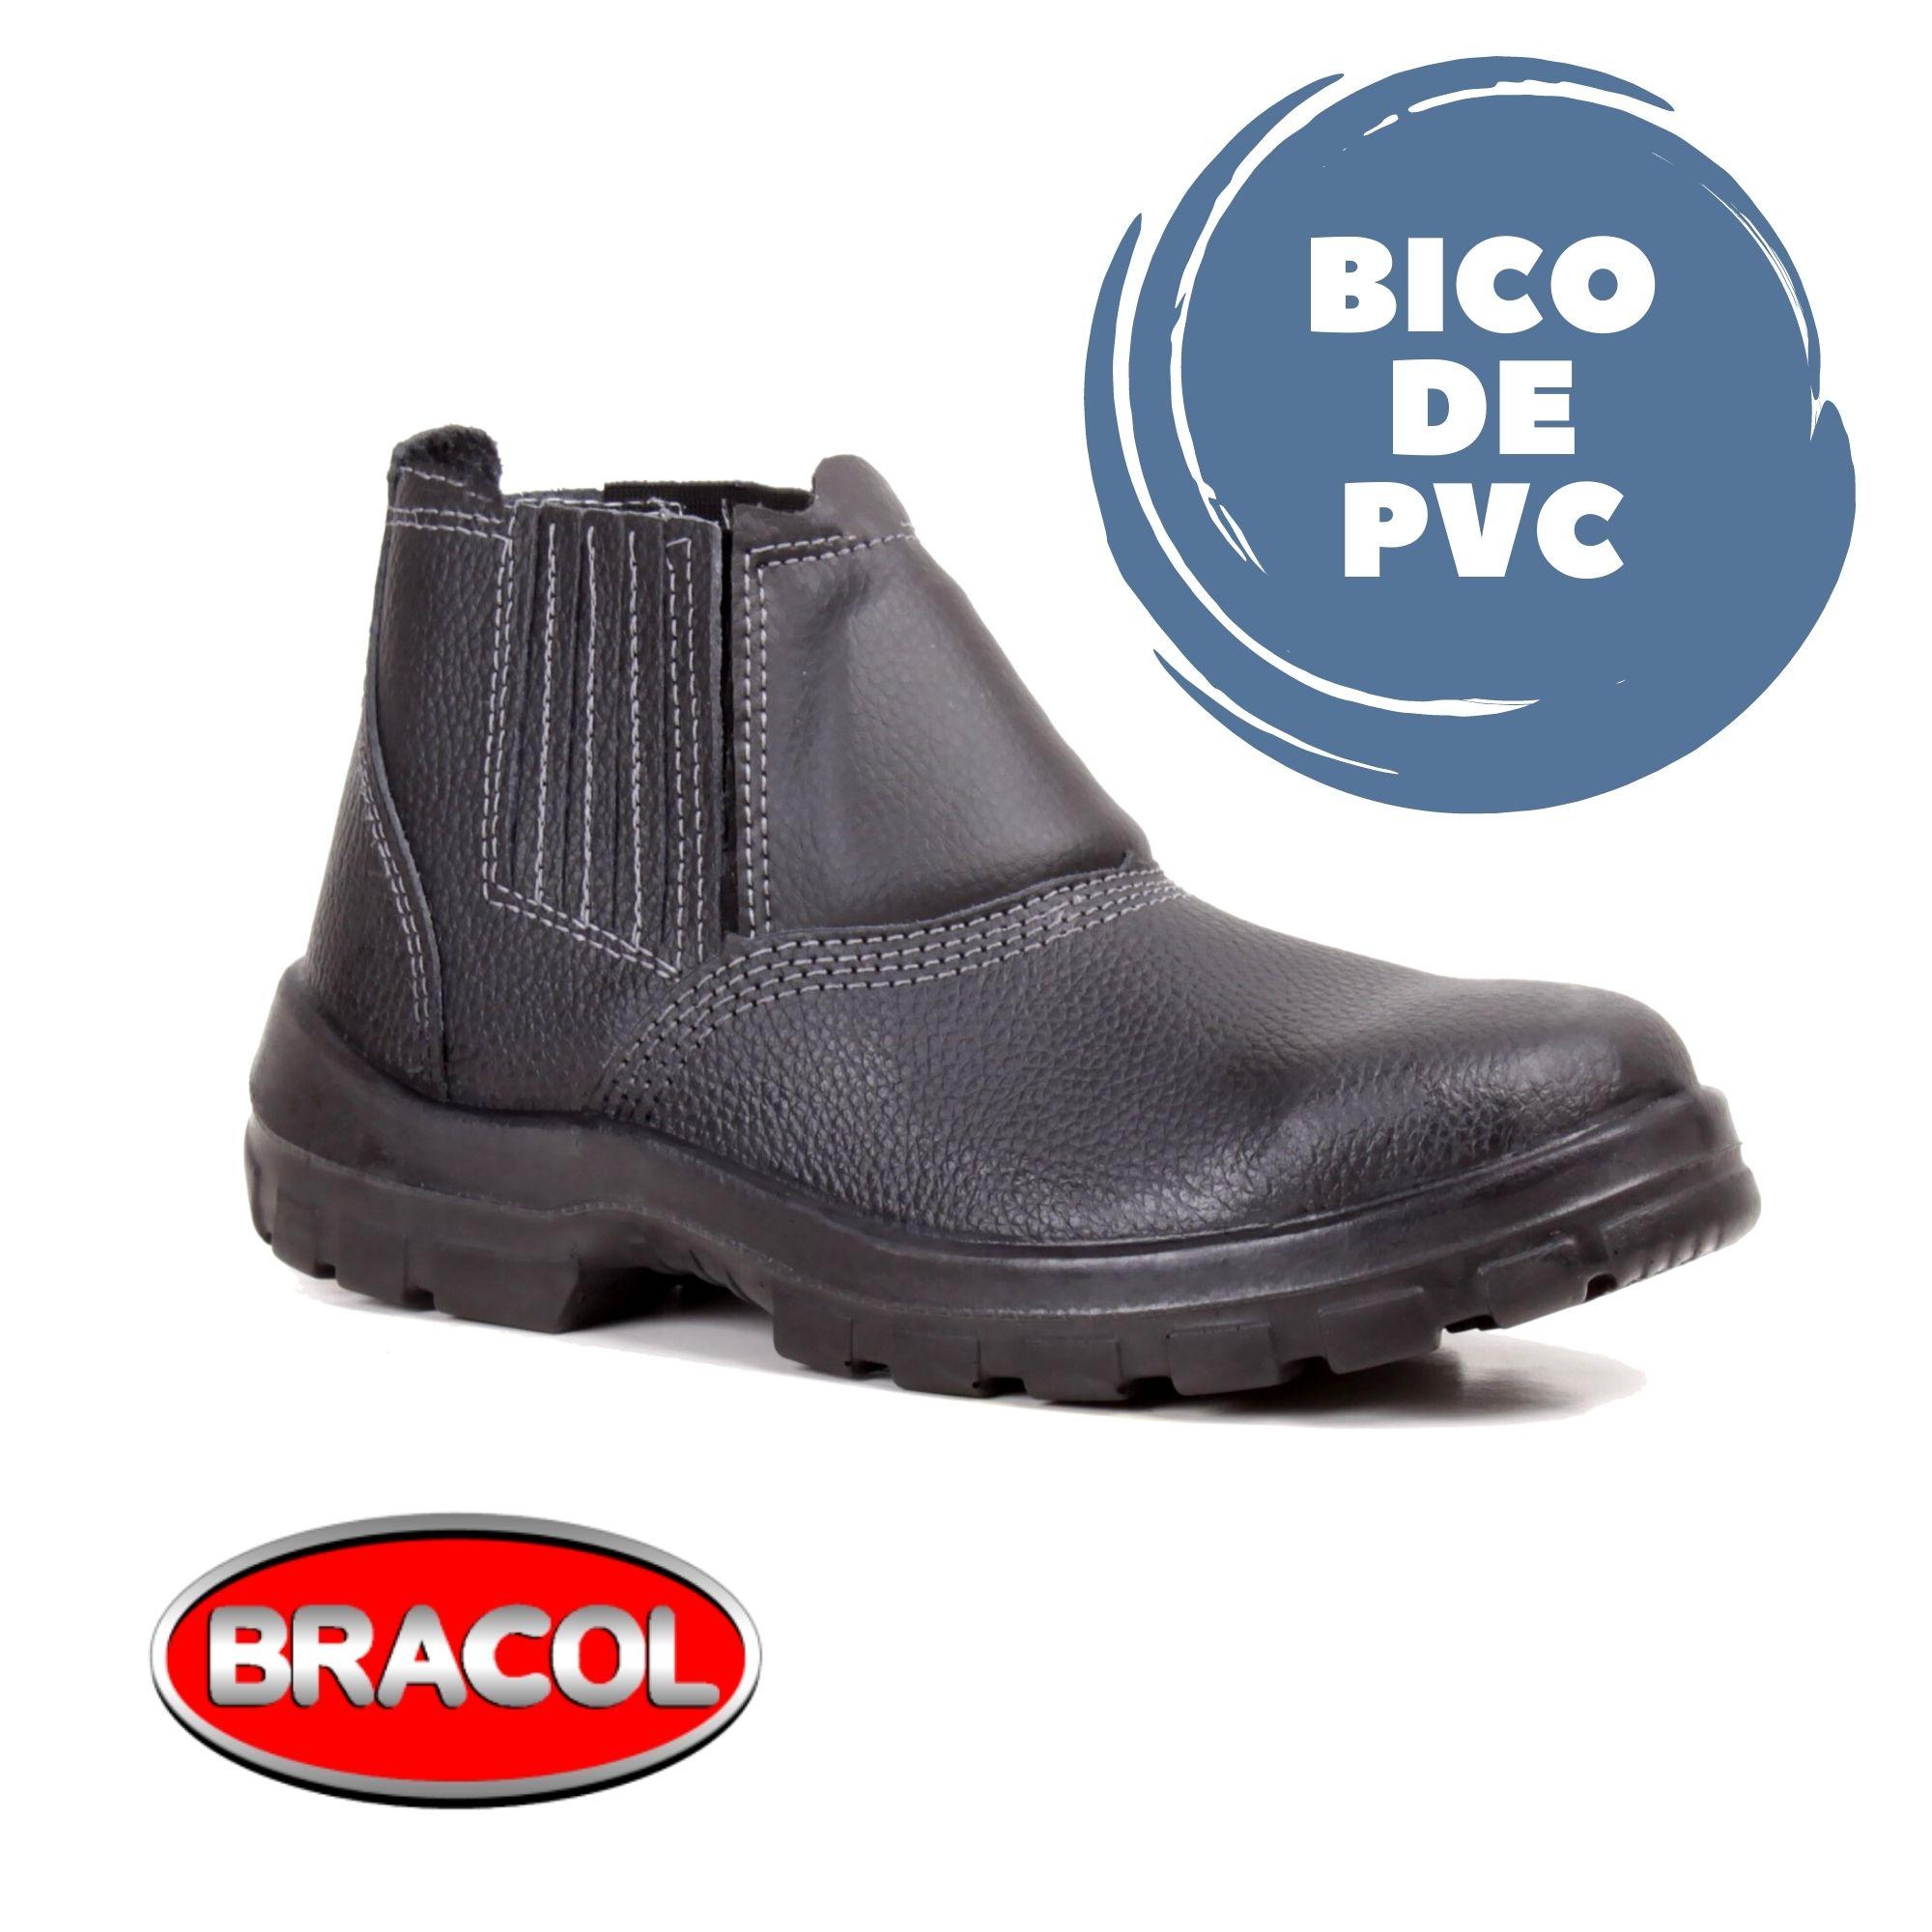 BOTINA DE ELÁSTICO PRETA ACOLCHOADA SEM METAL BICO DE PVC - CA DE ELETRICISTA - BRACOL  - DE PAULA EPI